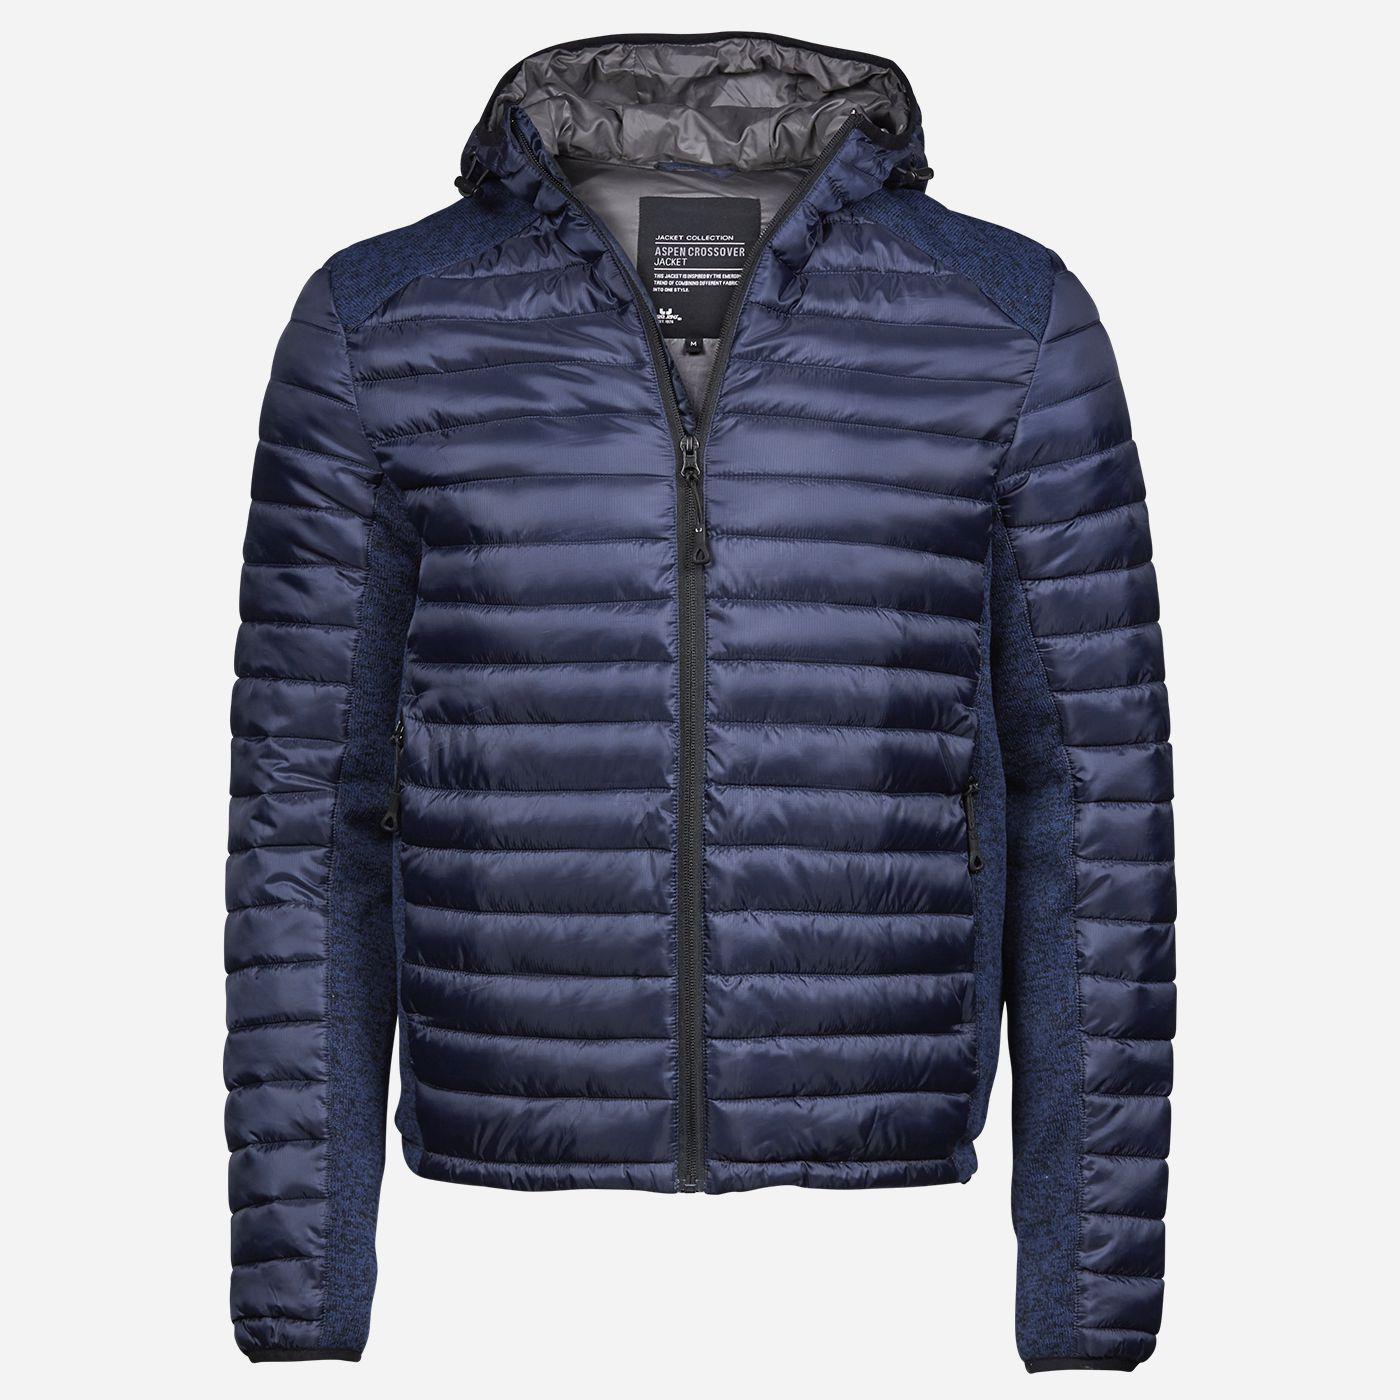 Tee Jays Tmavomodrá kombinovaná bunda Veľkosť: S